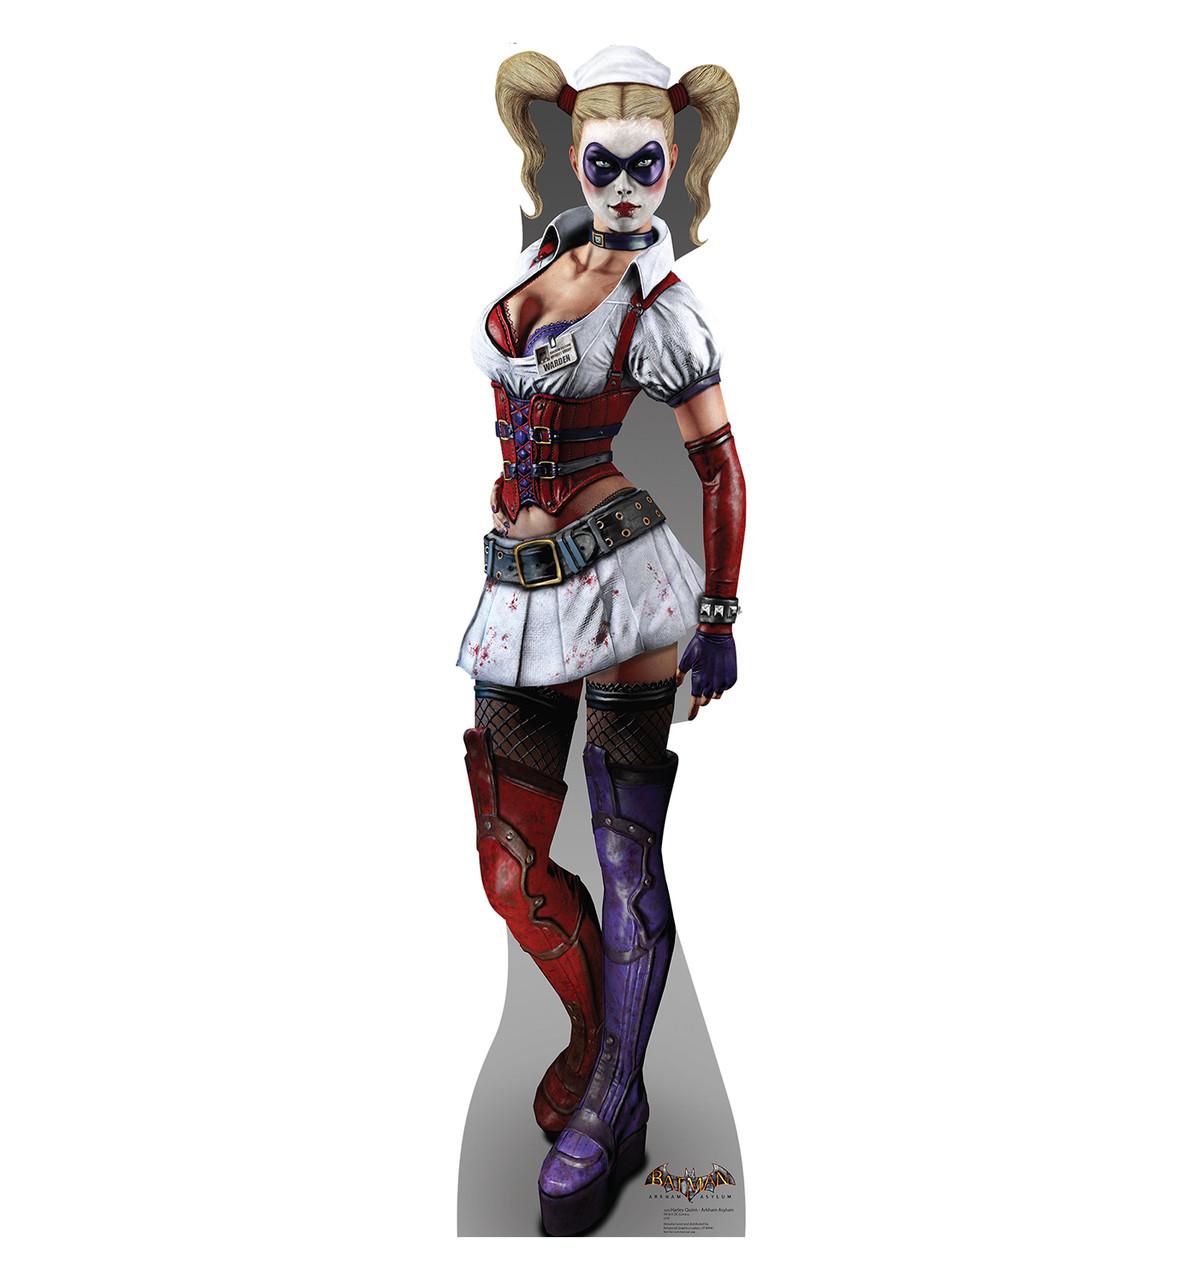 Life-size Harley Quinn - Arkham Asylum Cardboard Standup | Cardboard Cutout